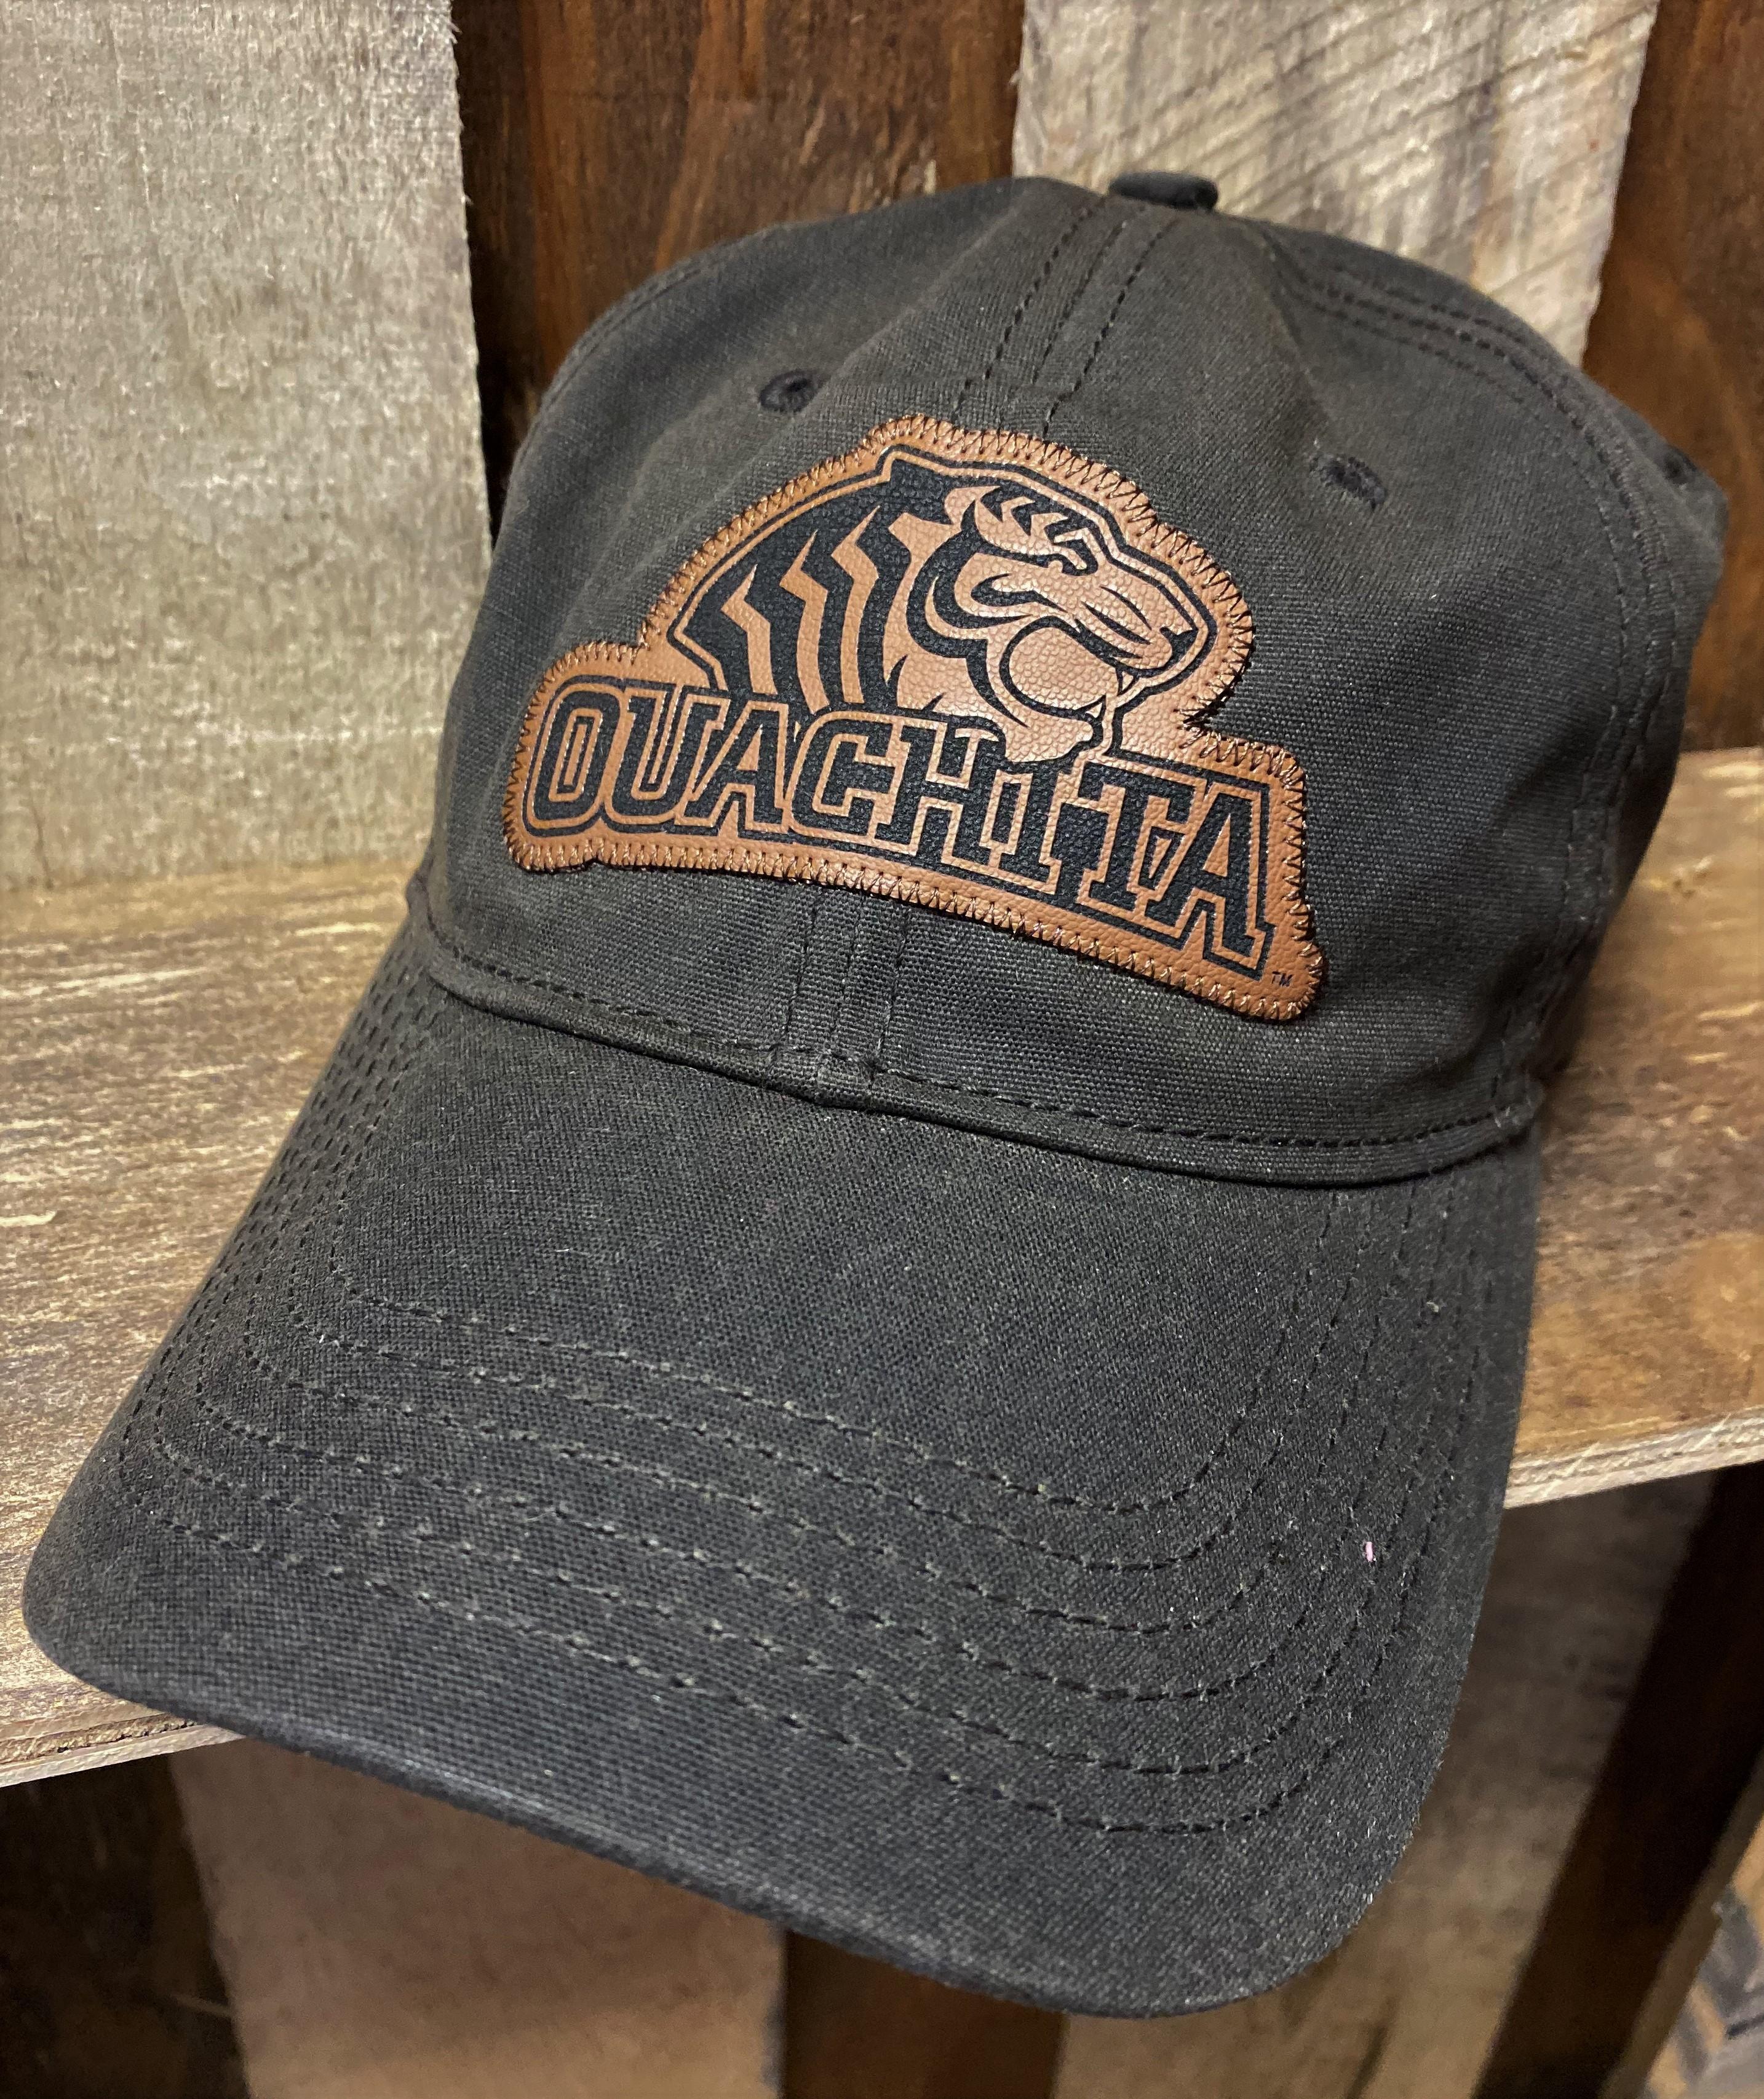 OUACHITA MASCOT LEATHER HAT